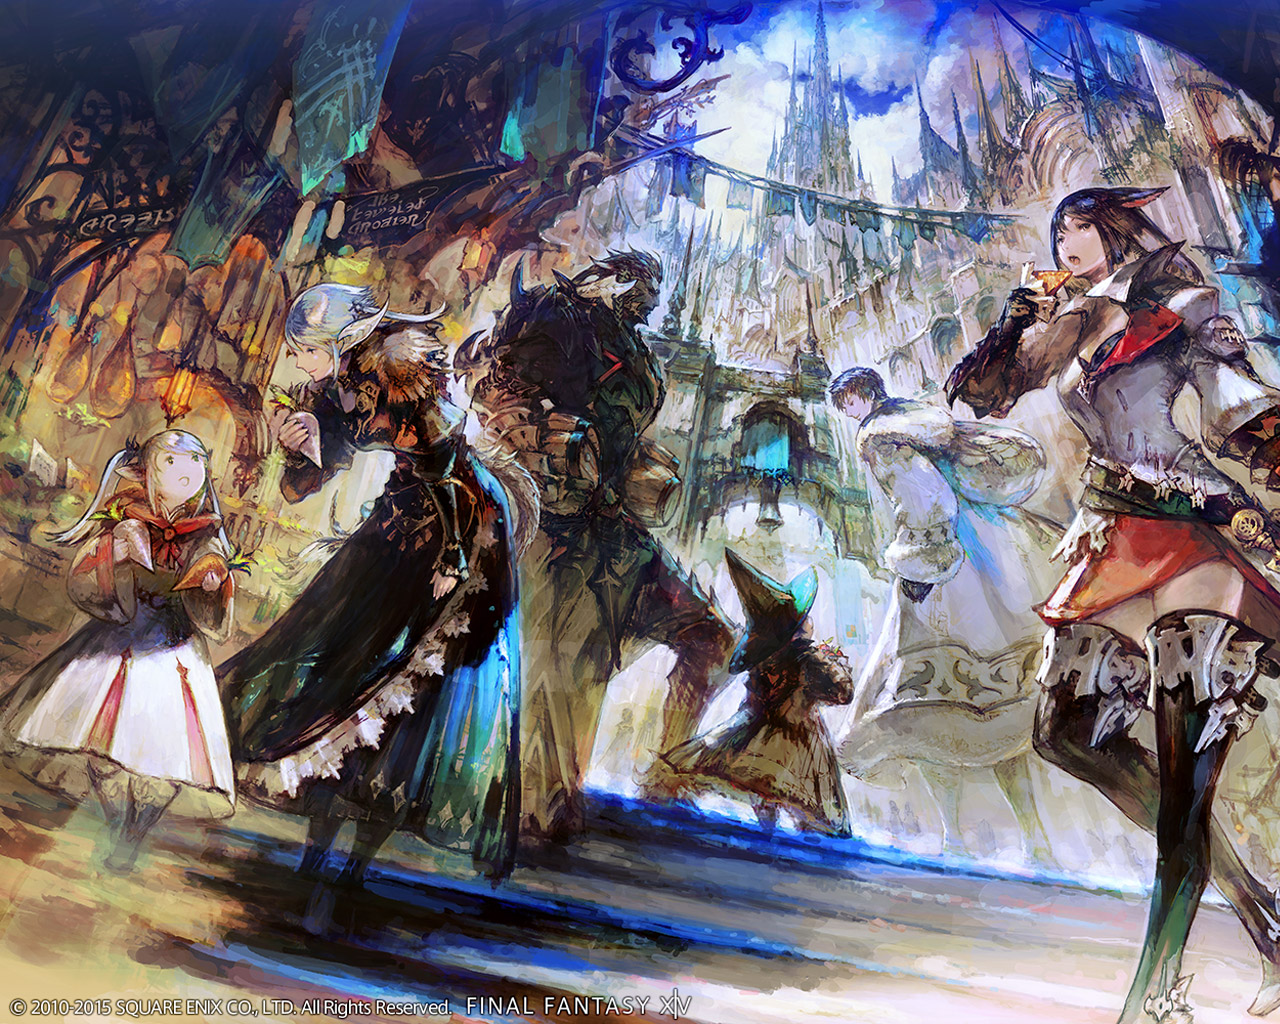 Free Final Fantasy XIV Wallpaper in 1280x1024